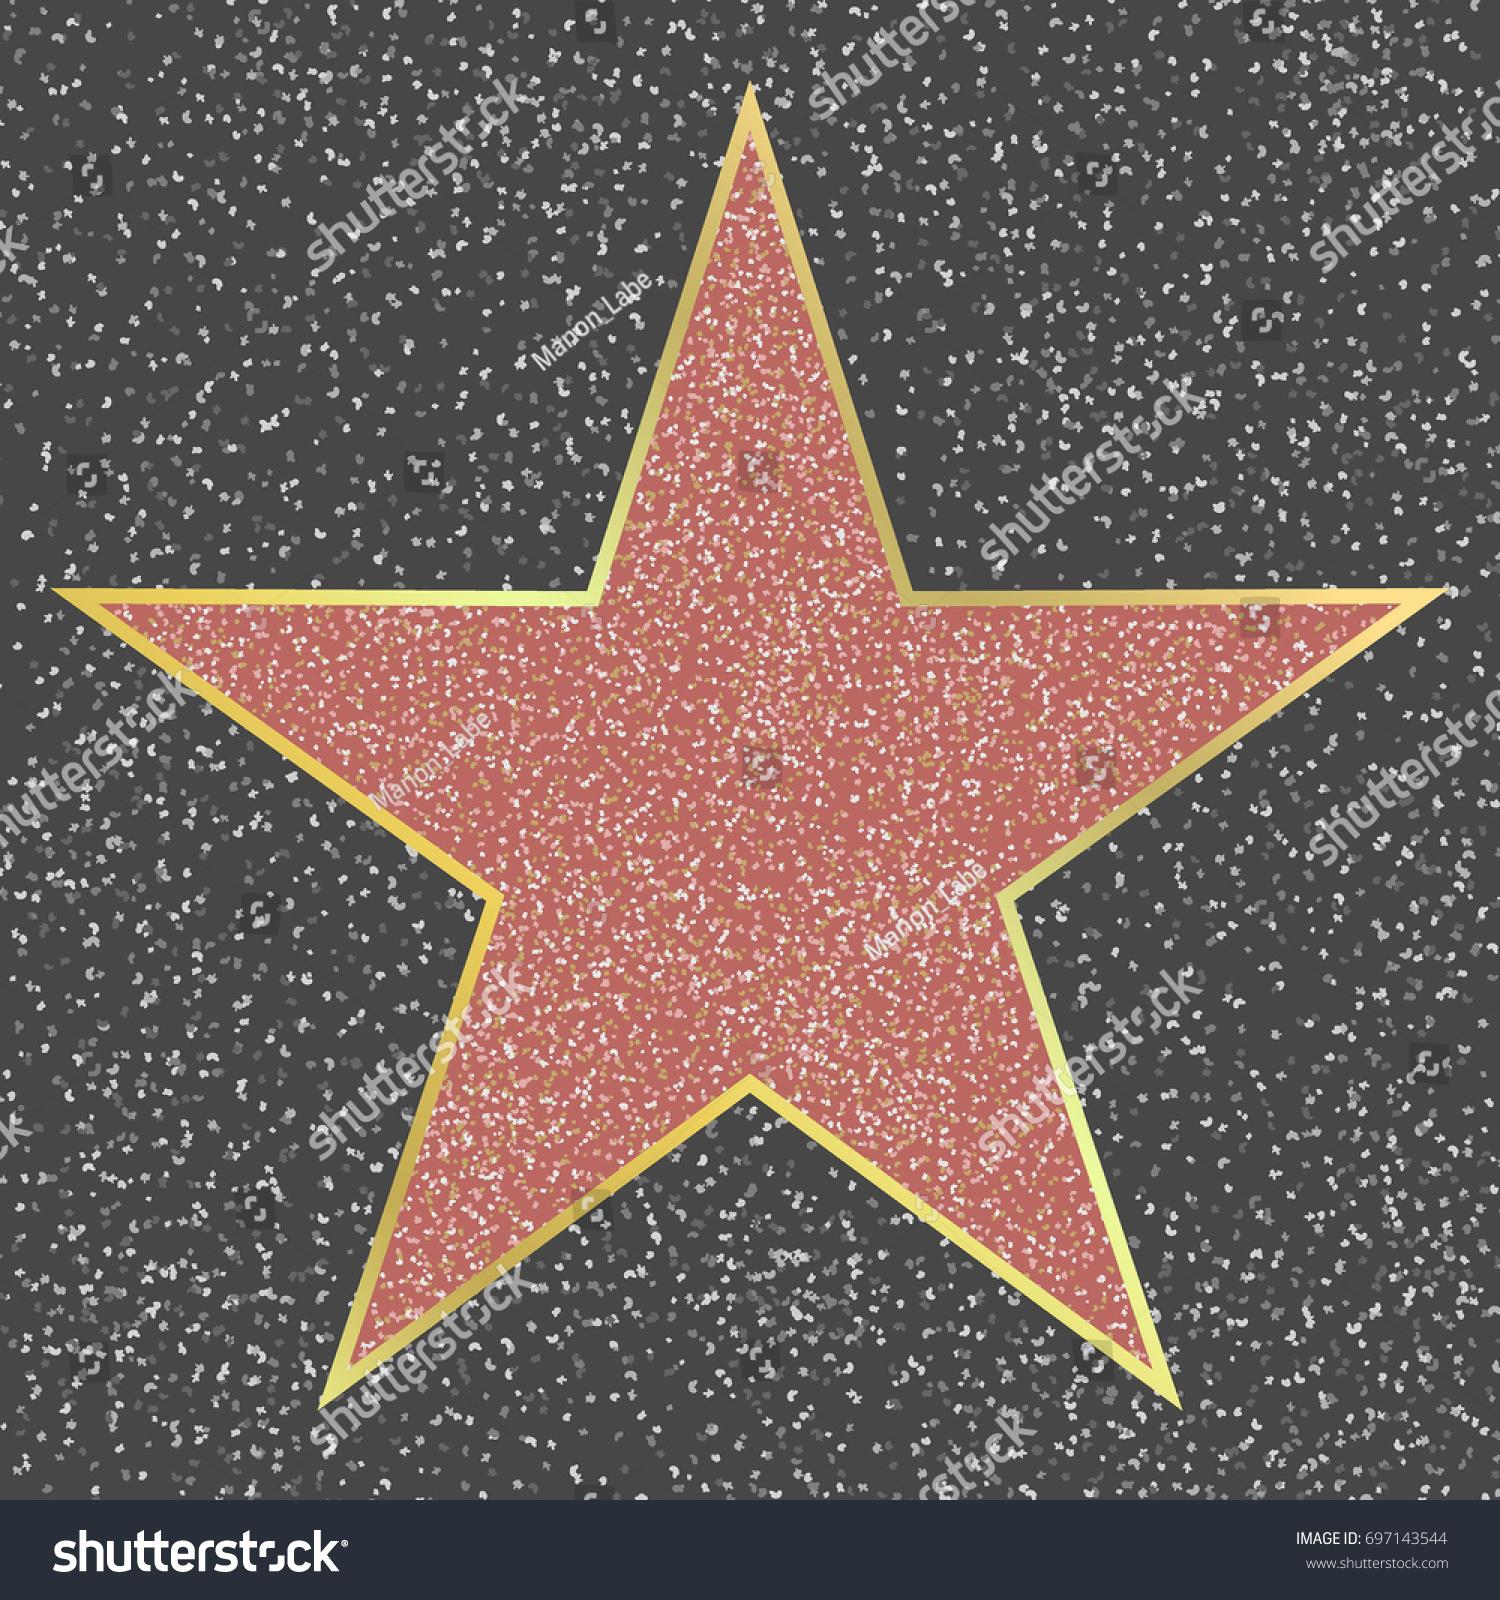 wwwStarMusicHDCom  StarMusicHD7starhdme9xfilms